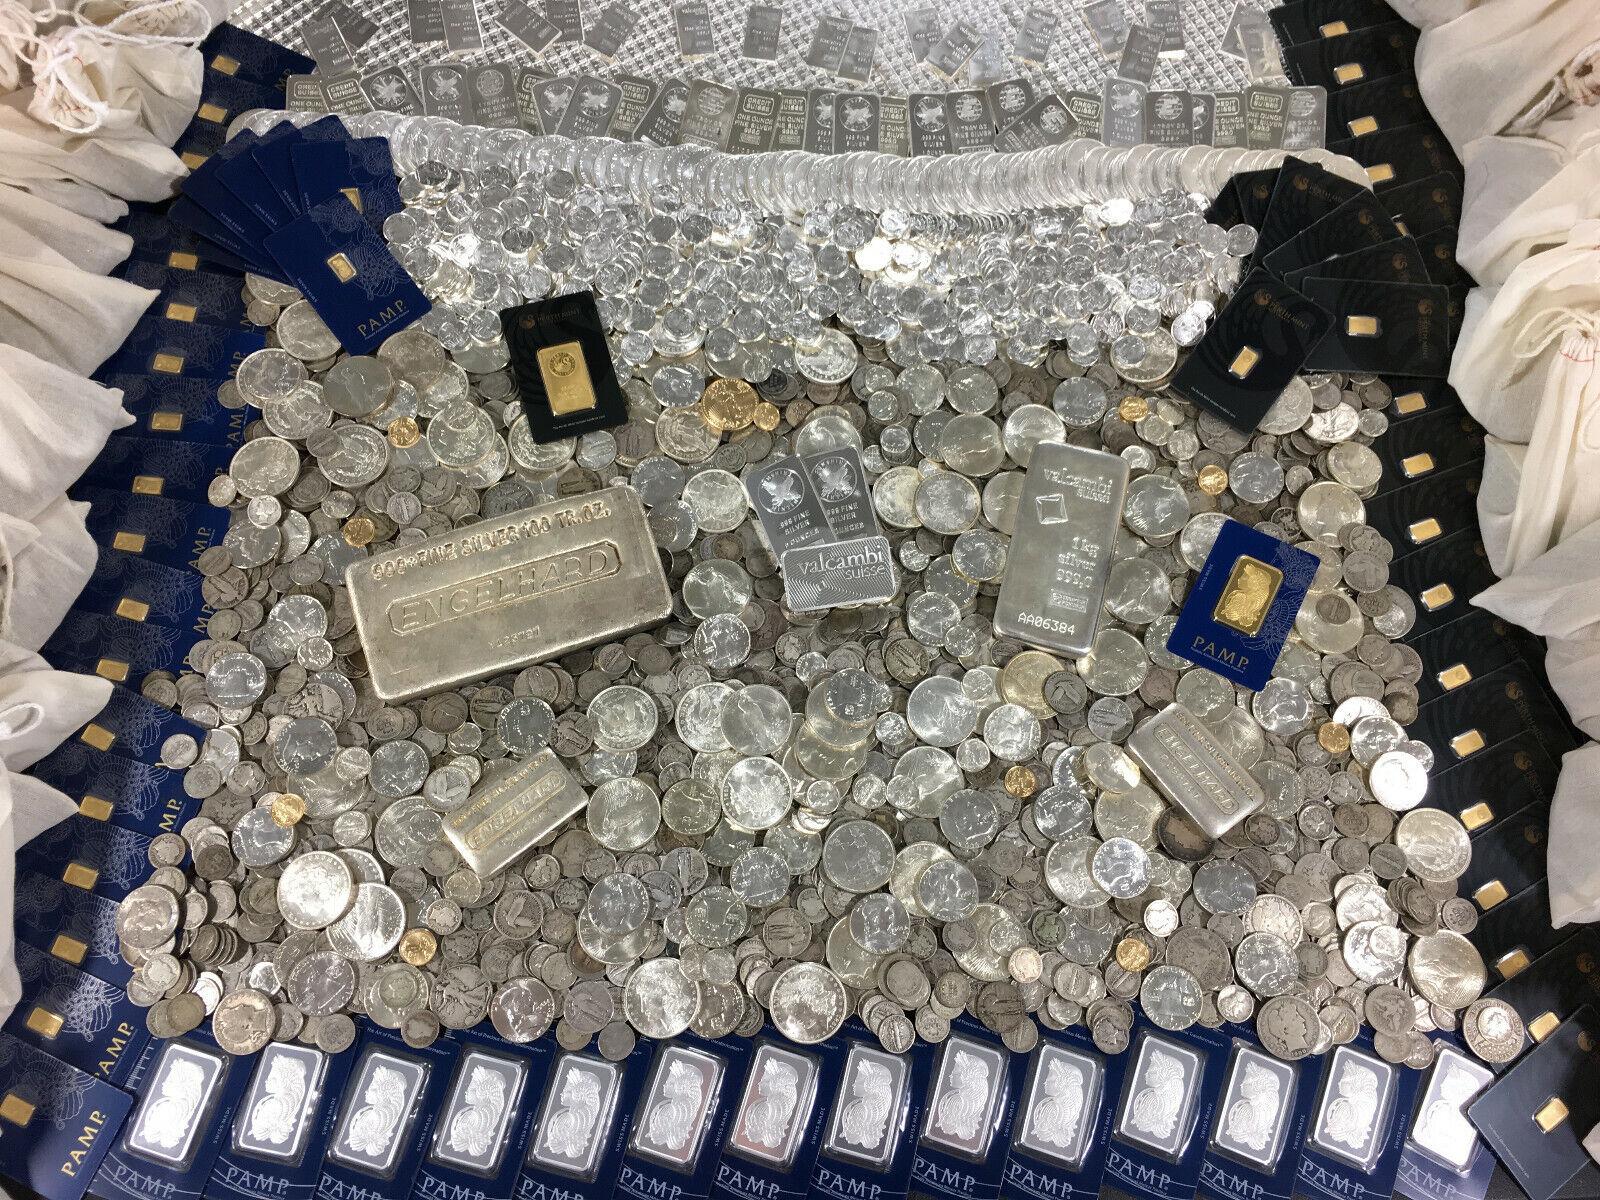 SILVER COINS OLD QUARTER UNCIRCULATED DIME BARBER MERCURY VINTAGE ESTATE SALE BU